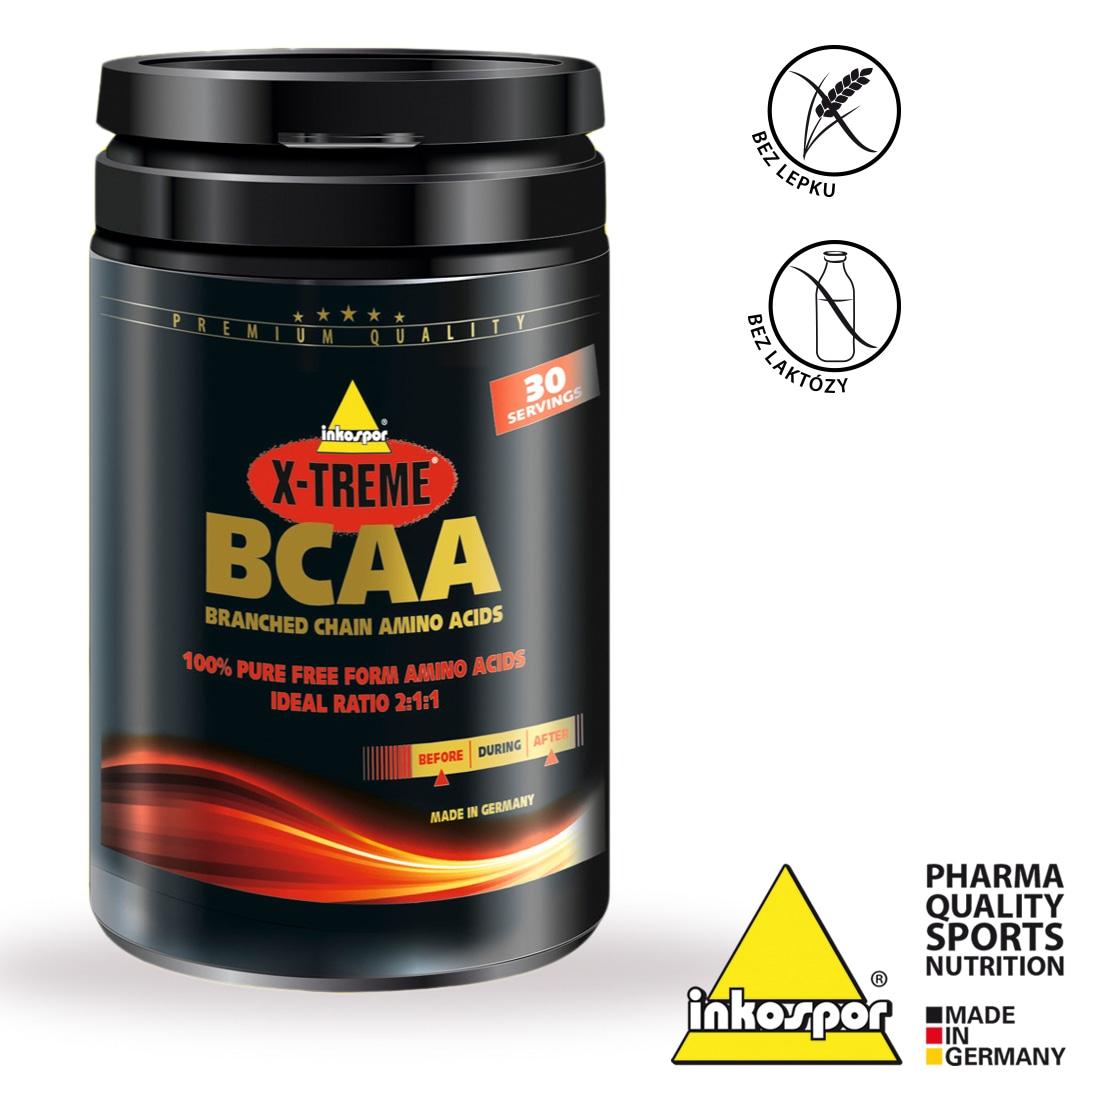 BCAA_new